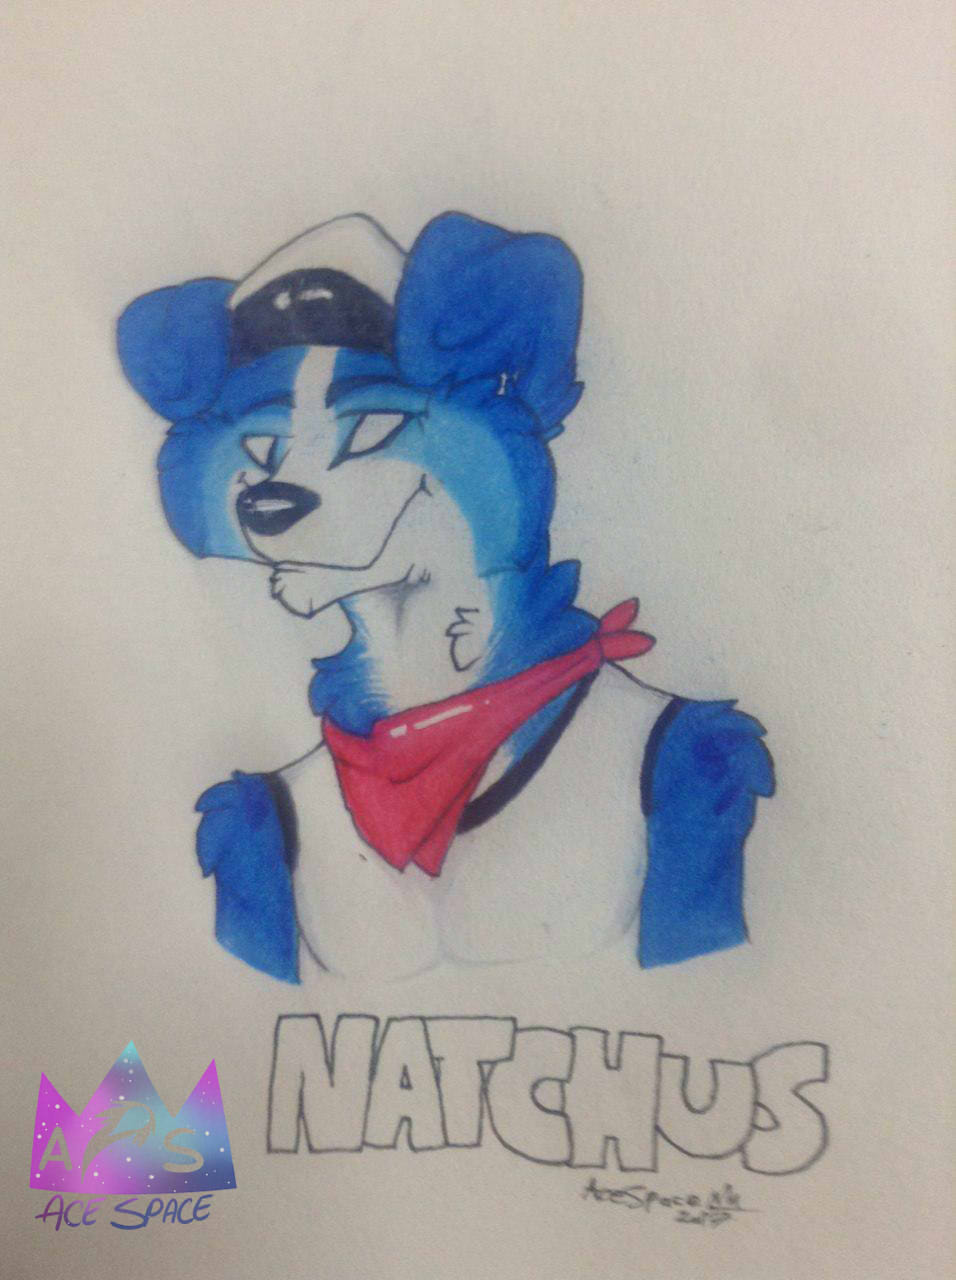 natchus badge